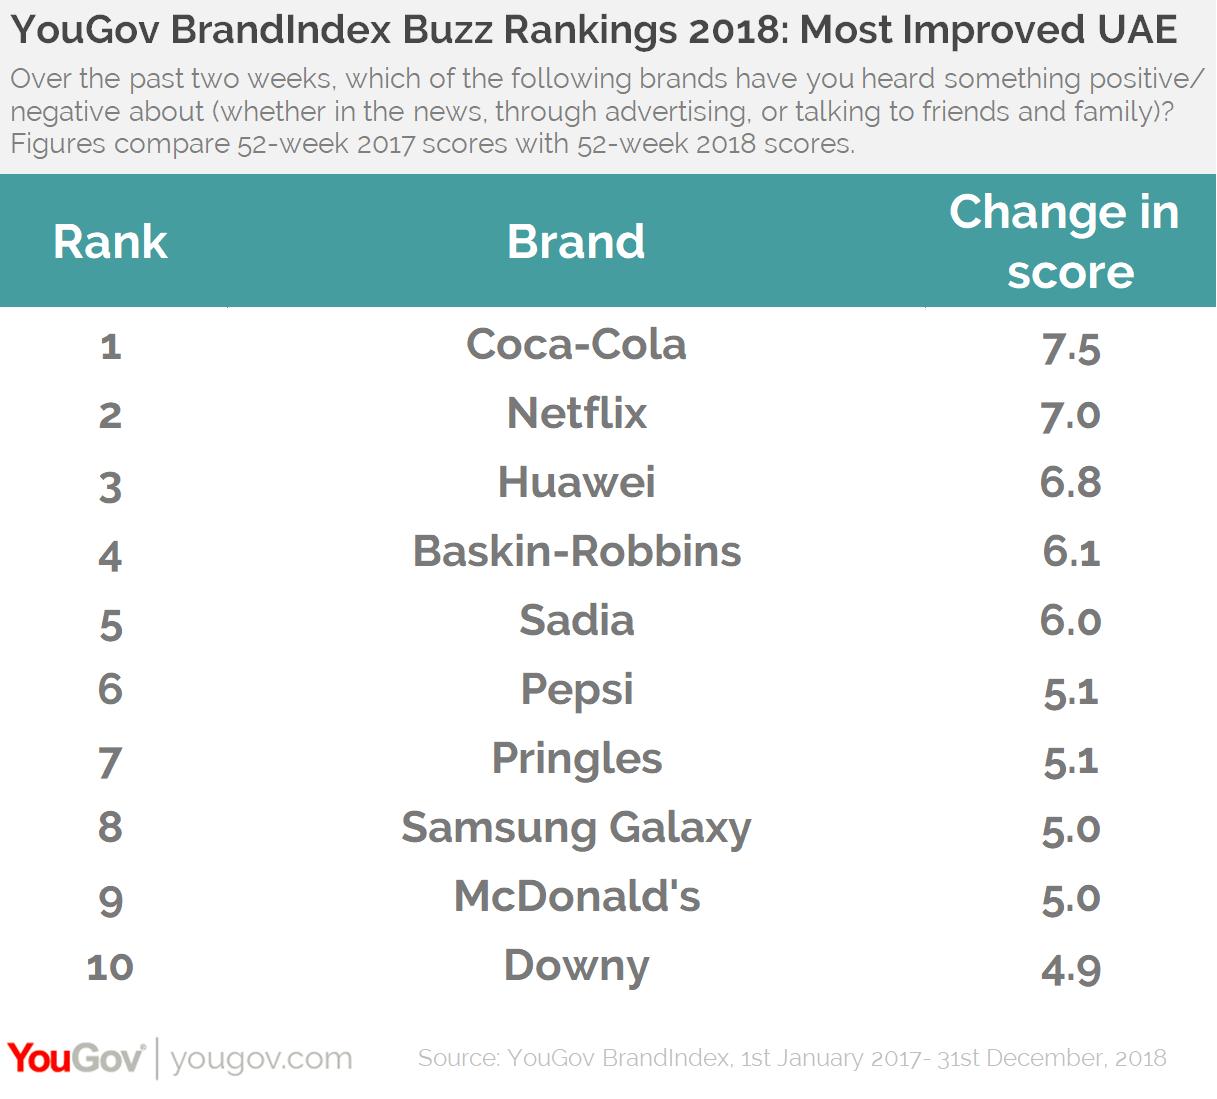 YouGov BrandIndex Buzz Rankings 2018- UAE Most Improved